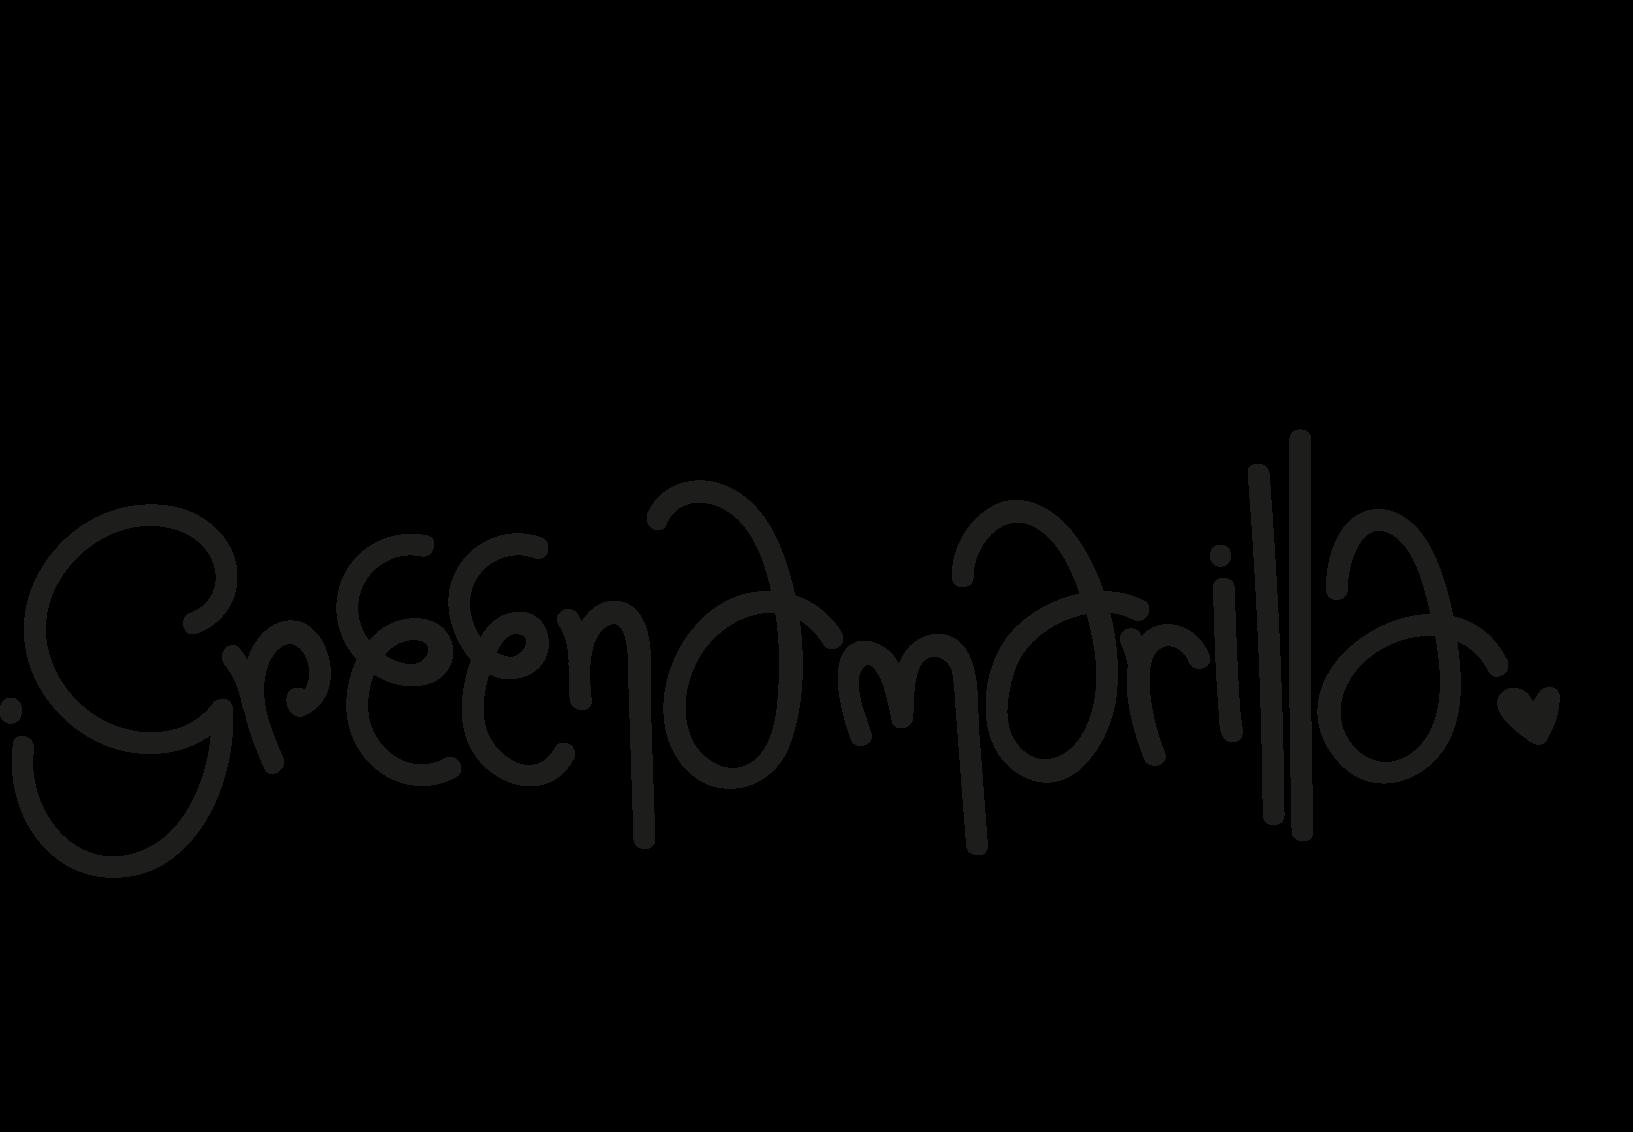 green amarilla